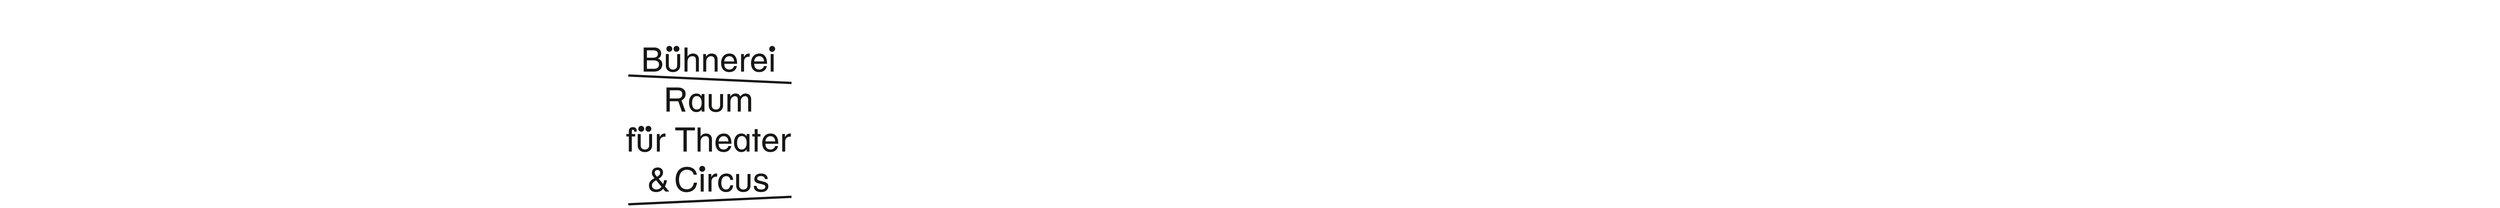 Logo_Buehnerei.jpg